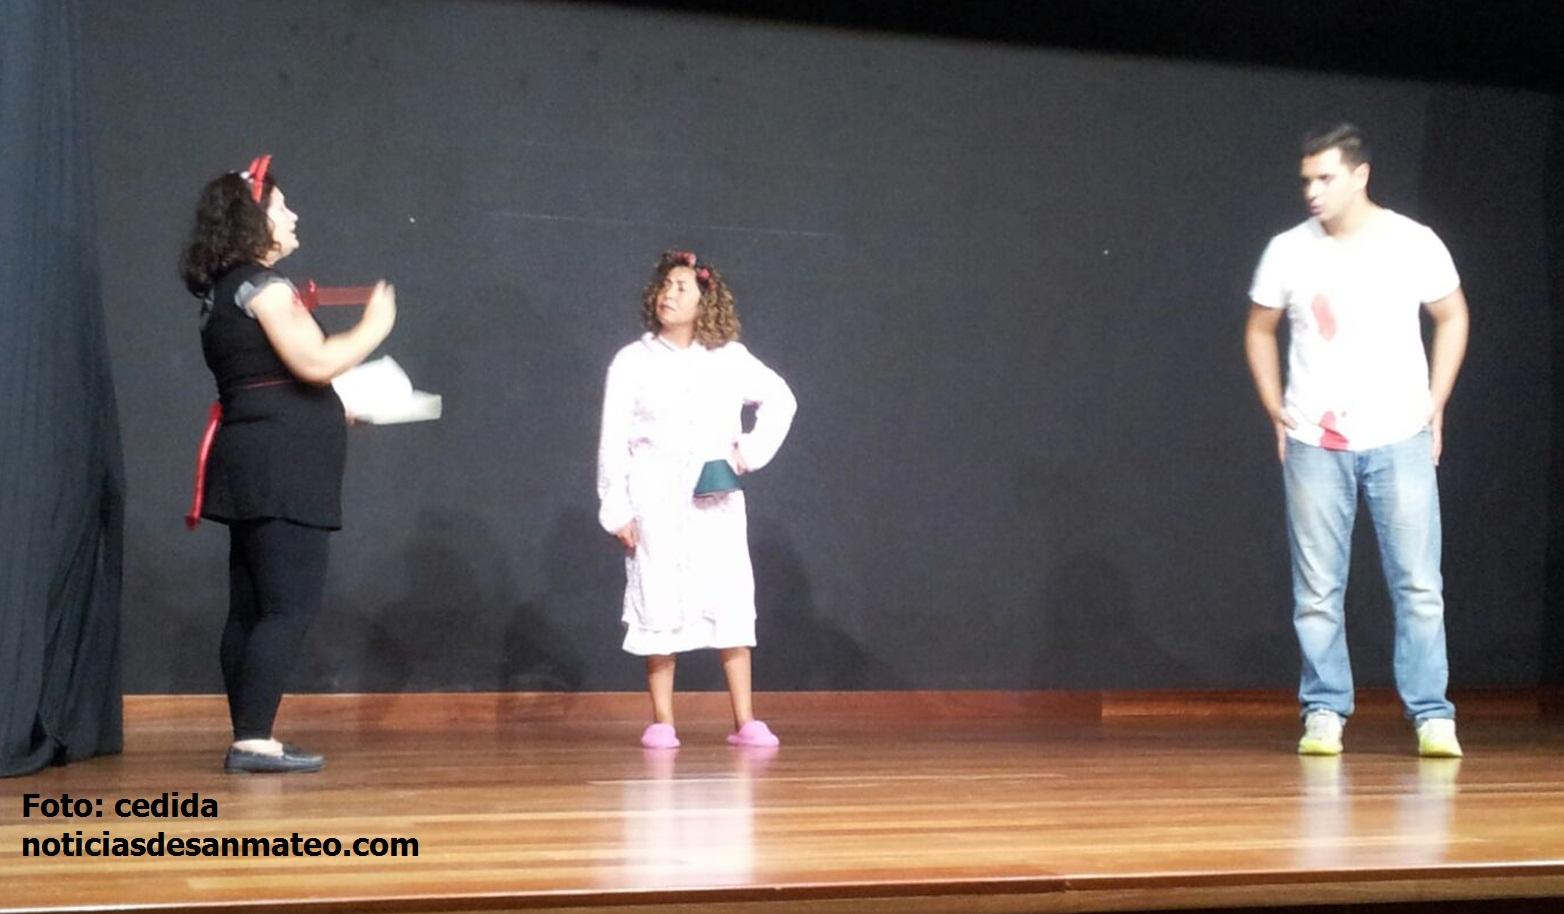 Ensalada de teatro 3 de octubre de 2015 Foto Laura Miranda